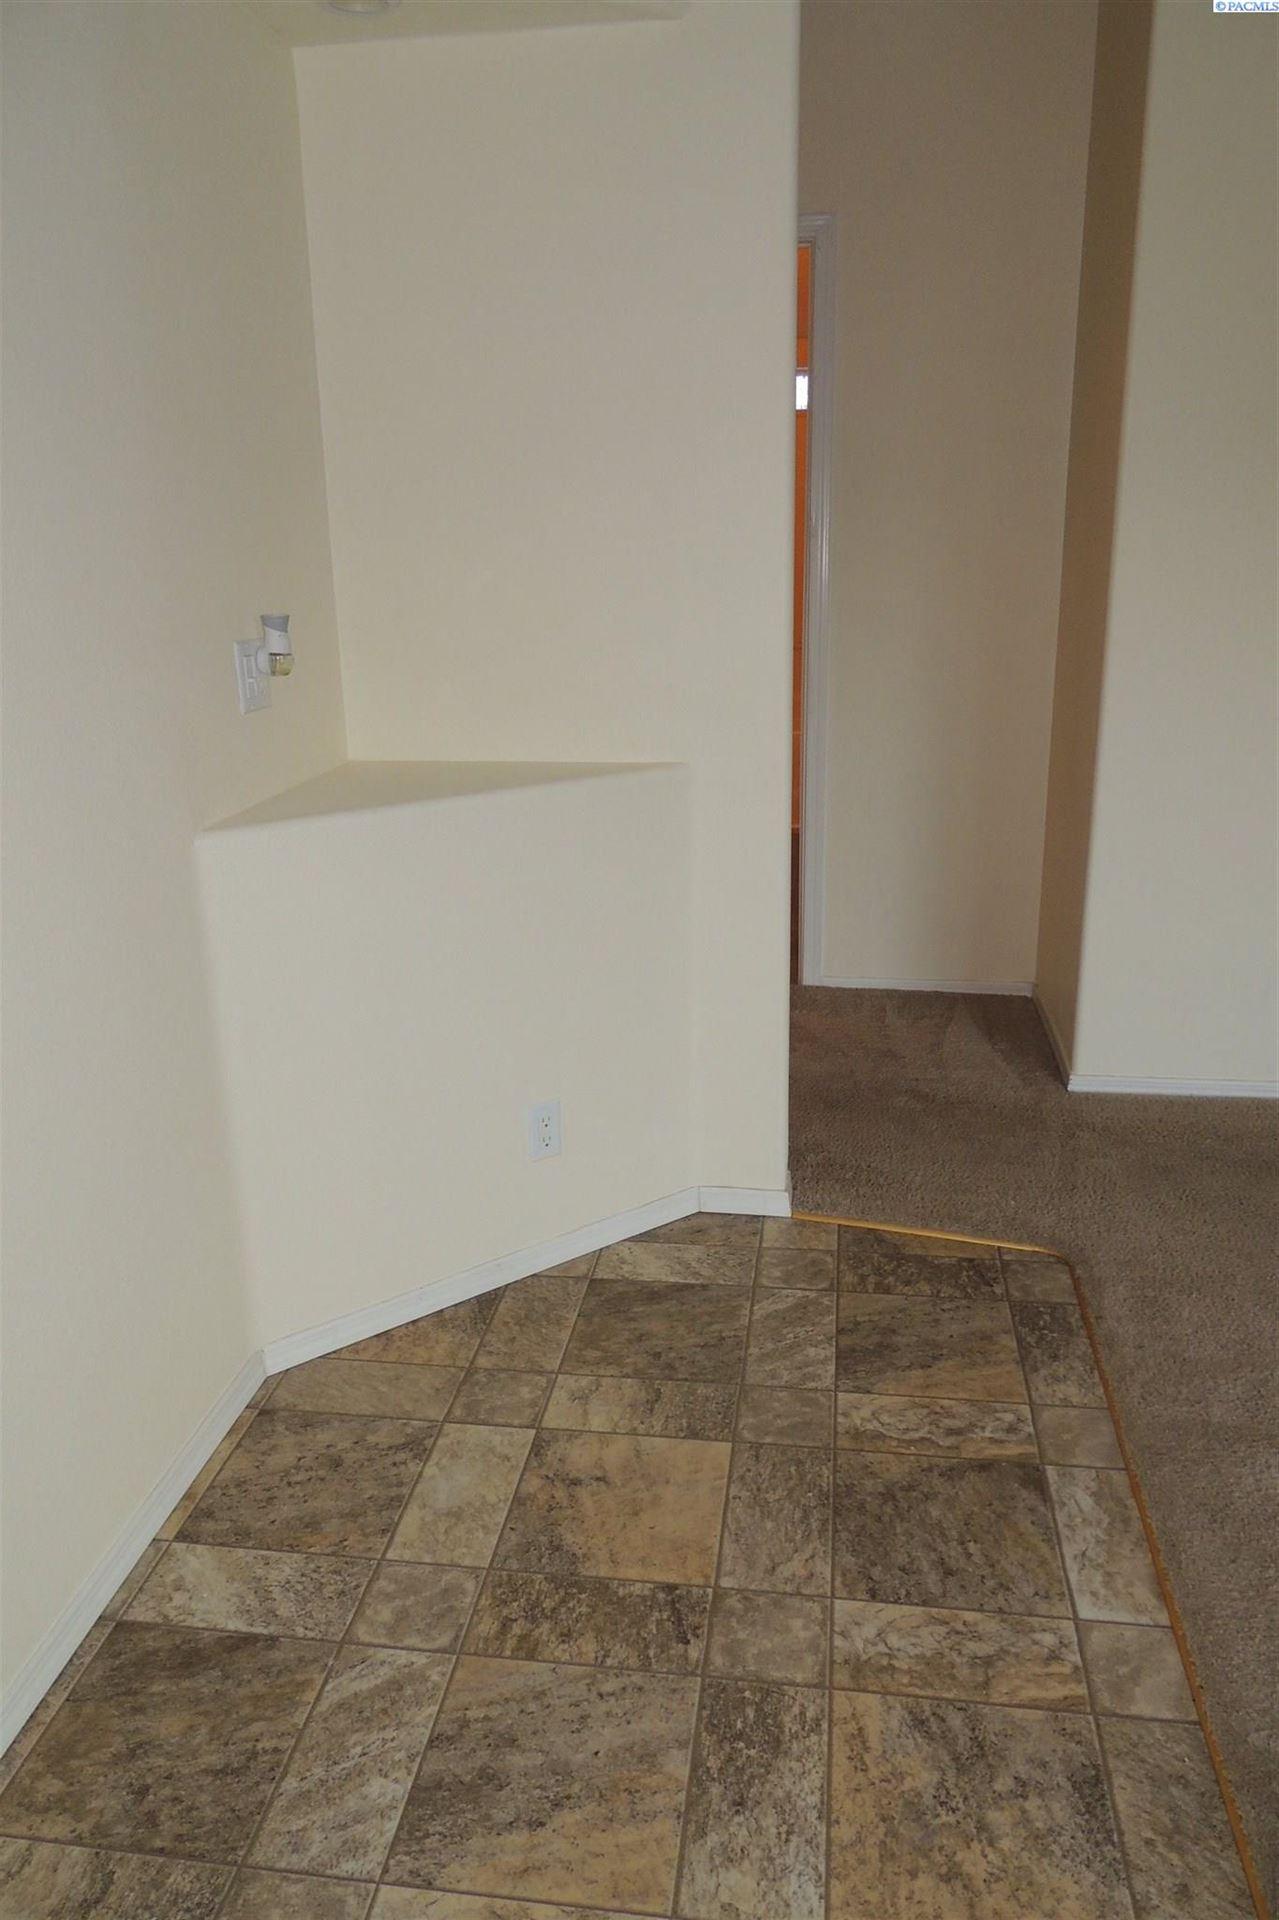 Photo of 113 NW Glenhaven, Pullman, WA 99163 (MLS # 252072)